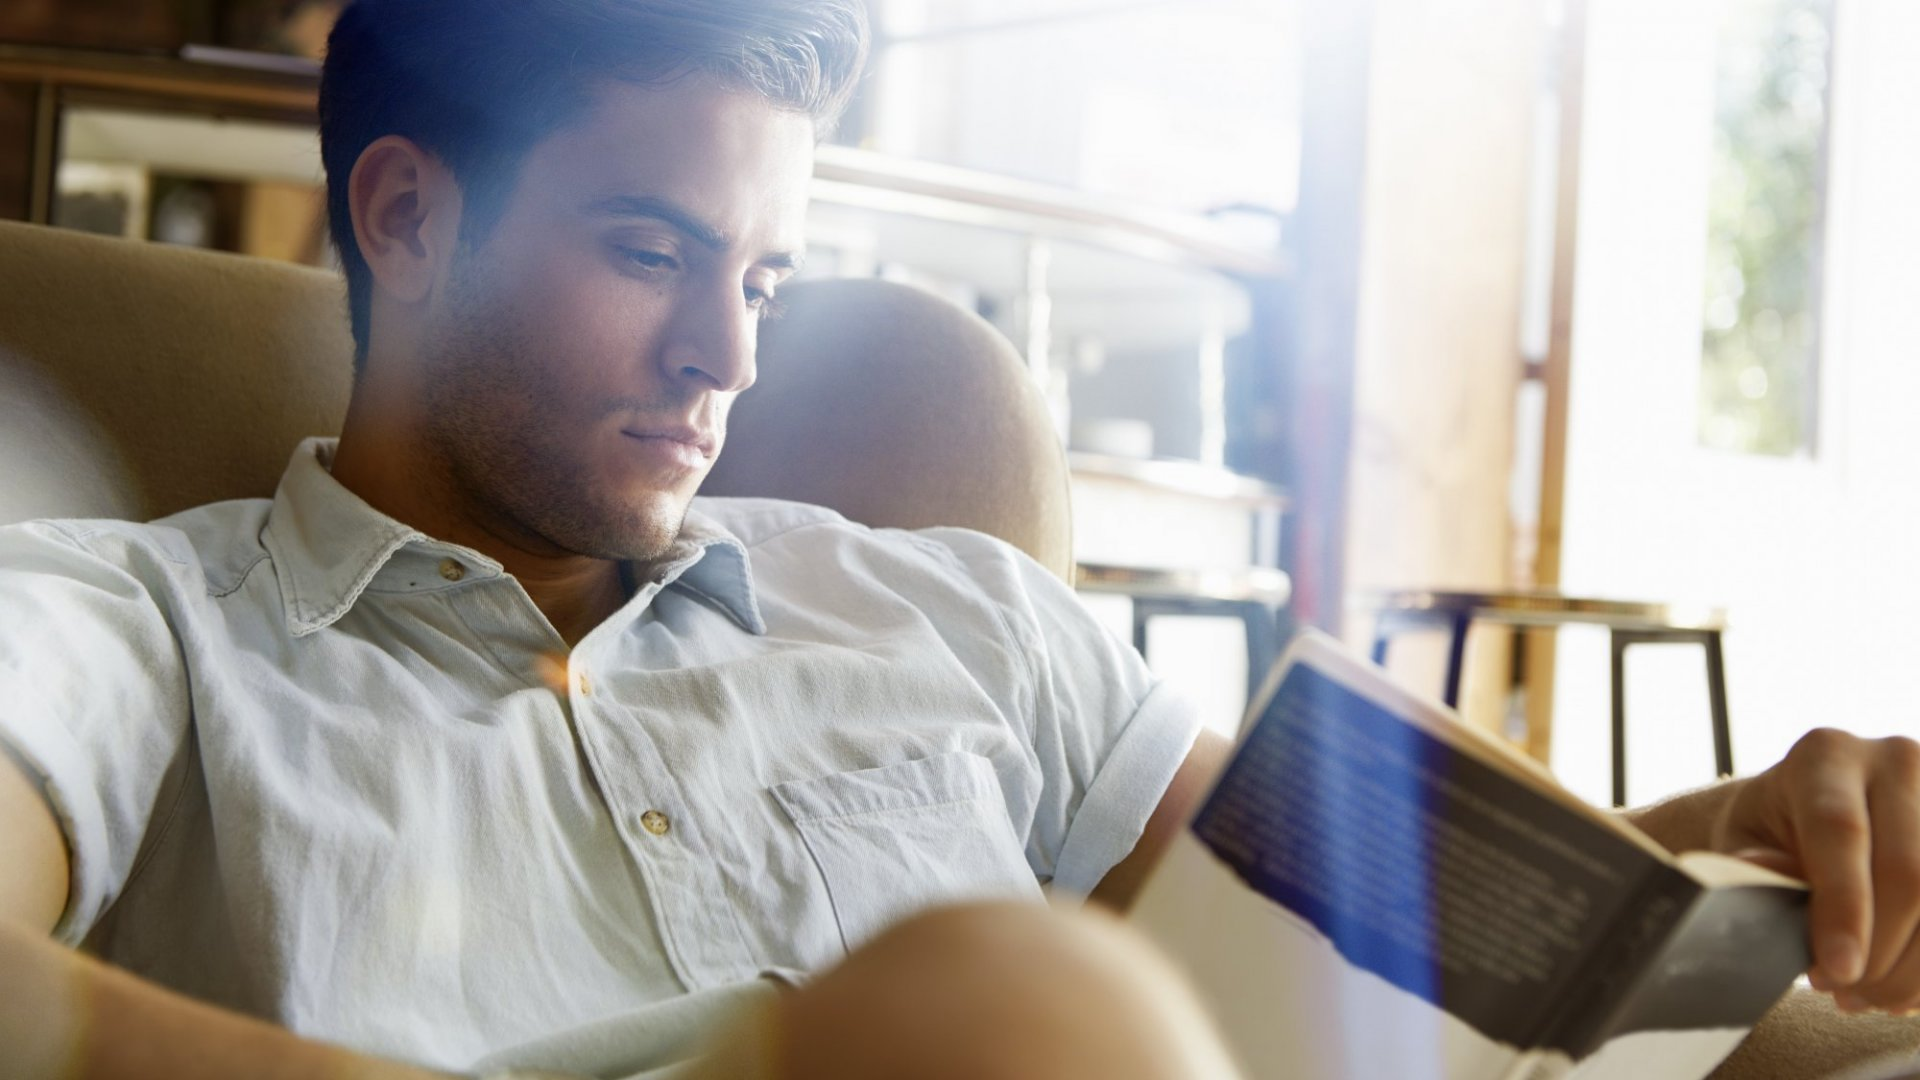 5 Books That Will Inspire Your Entrepreneurial Spirit